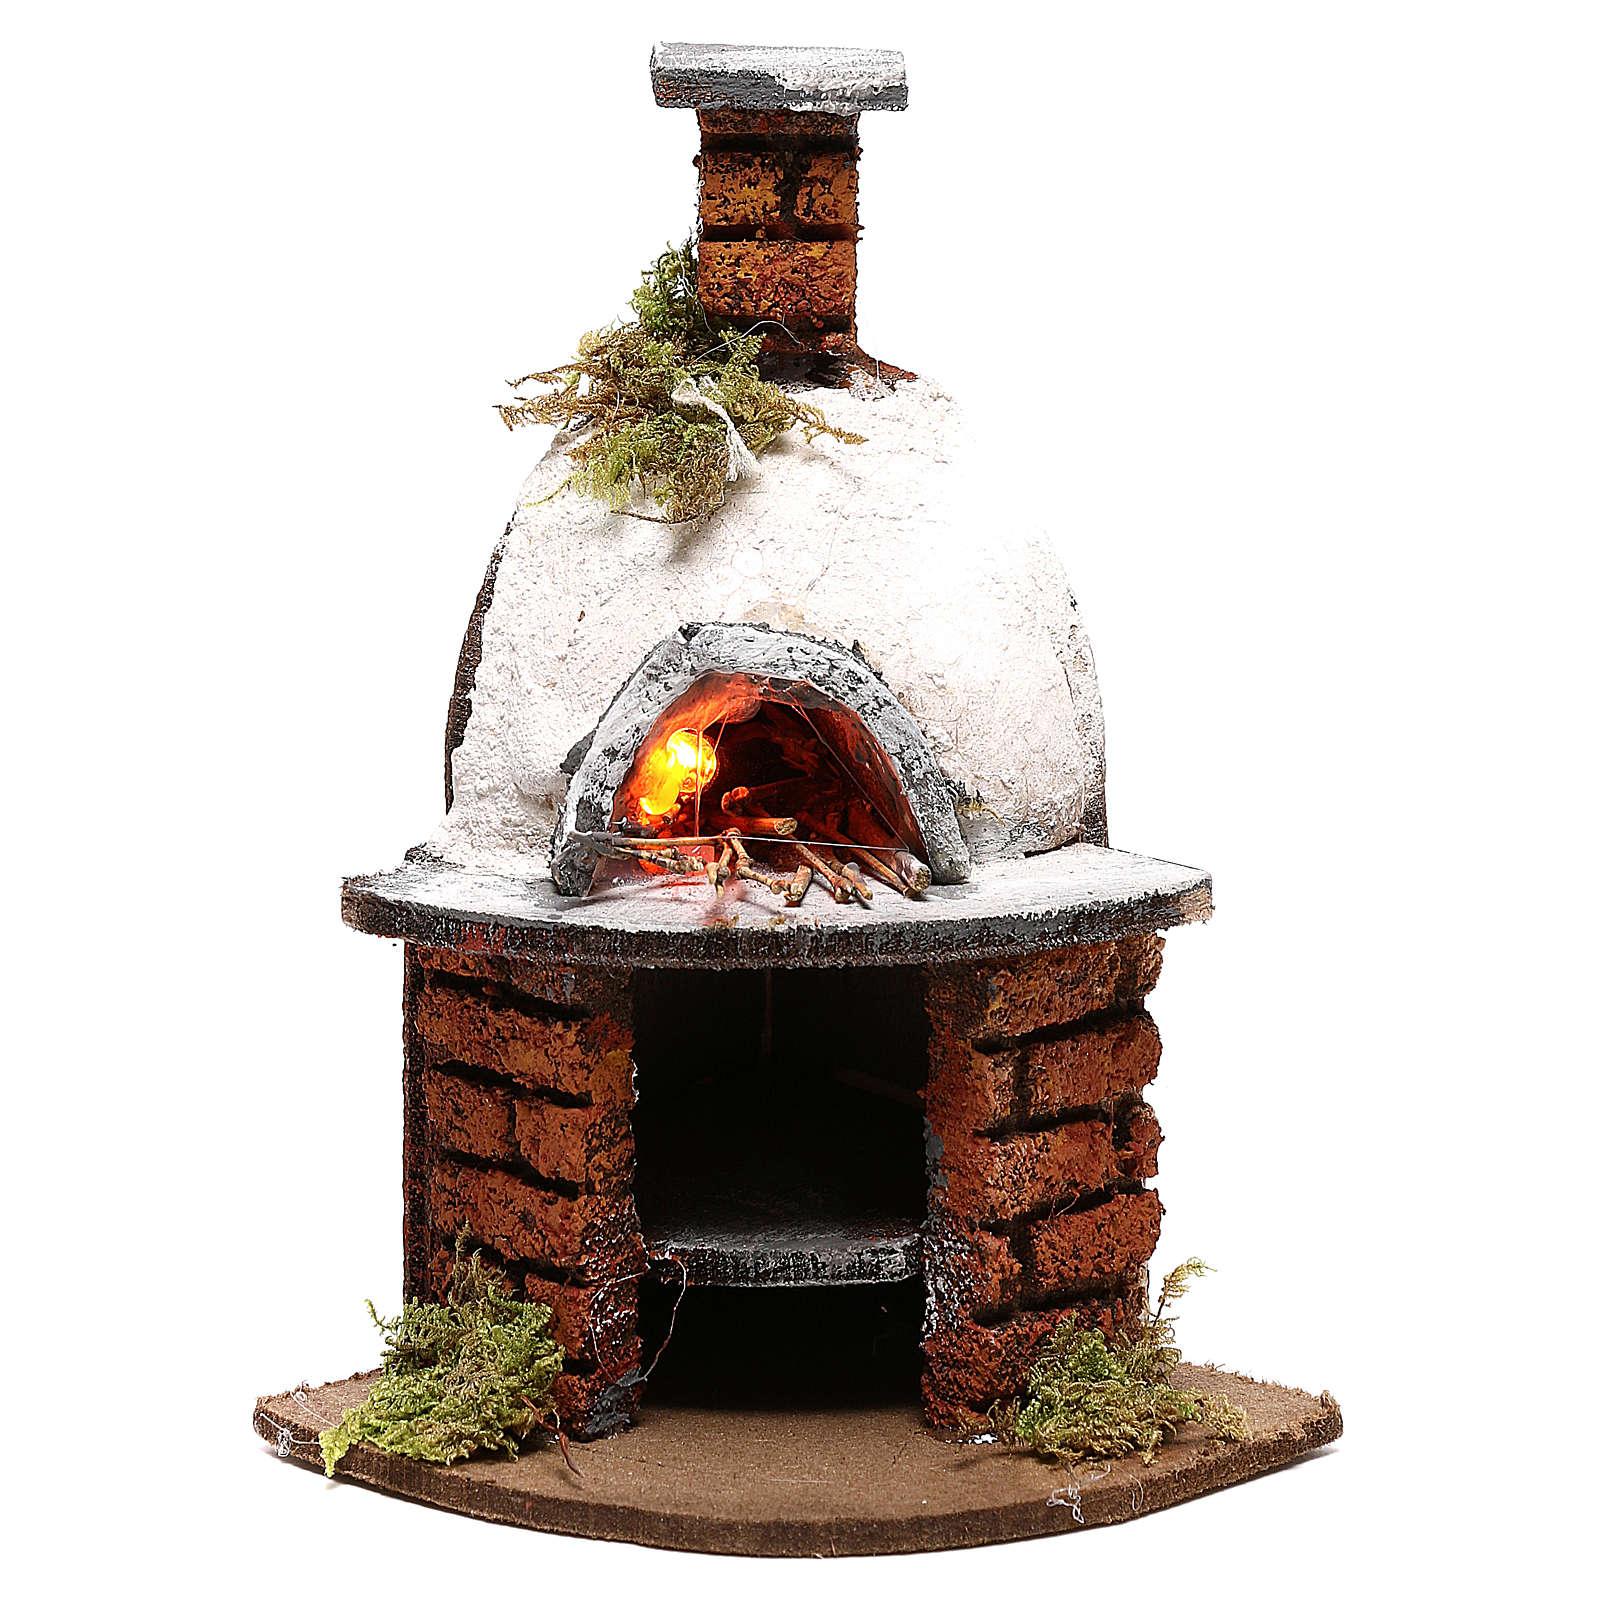 Dome oven for Neapolitan Nativity scene of 10 cm 4